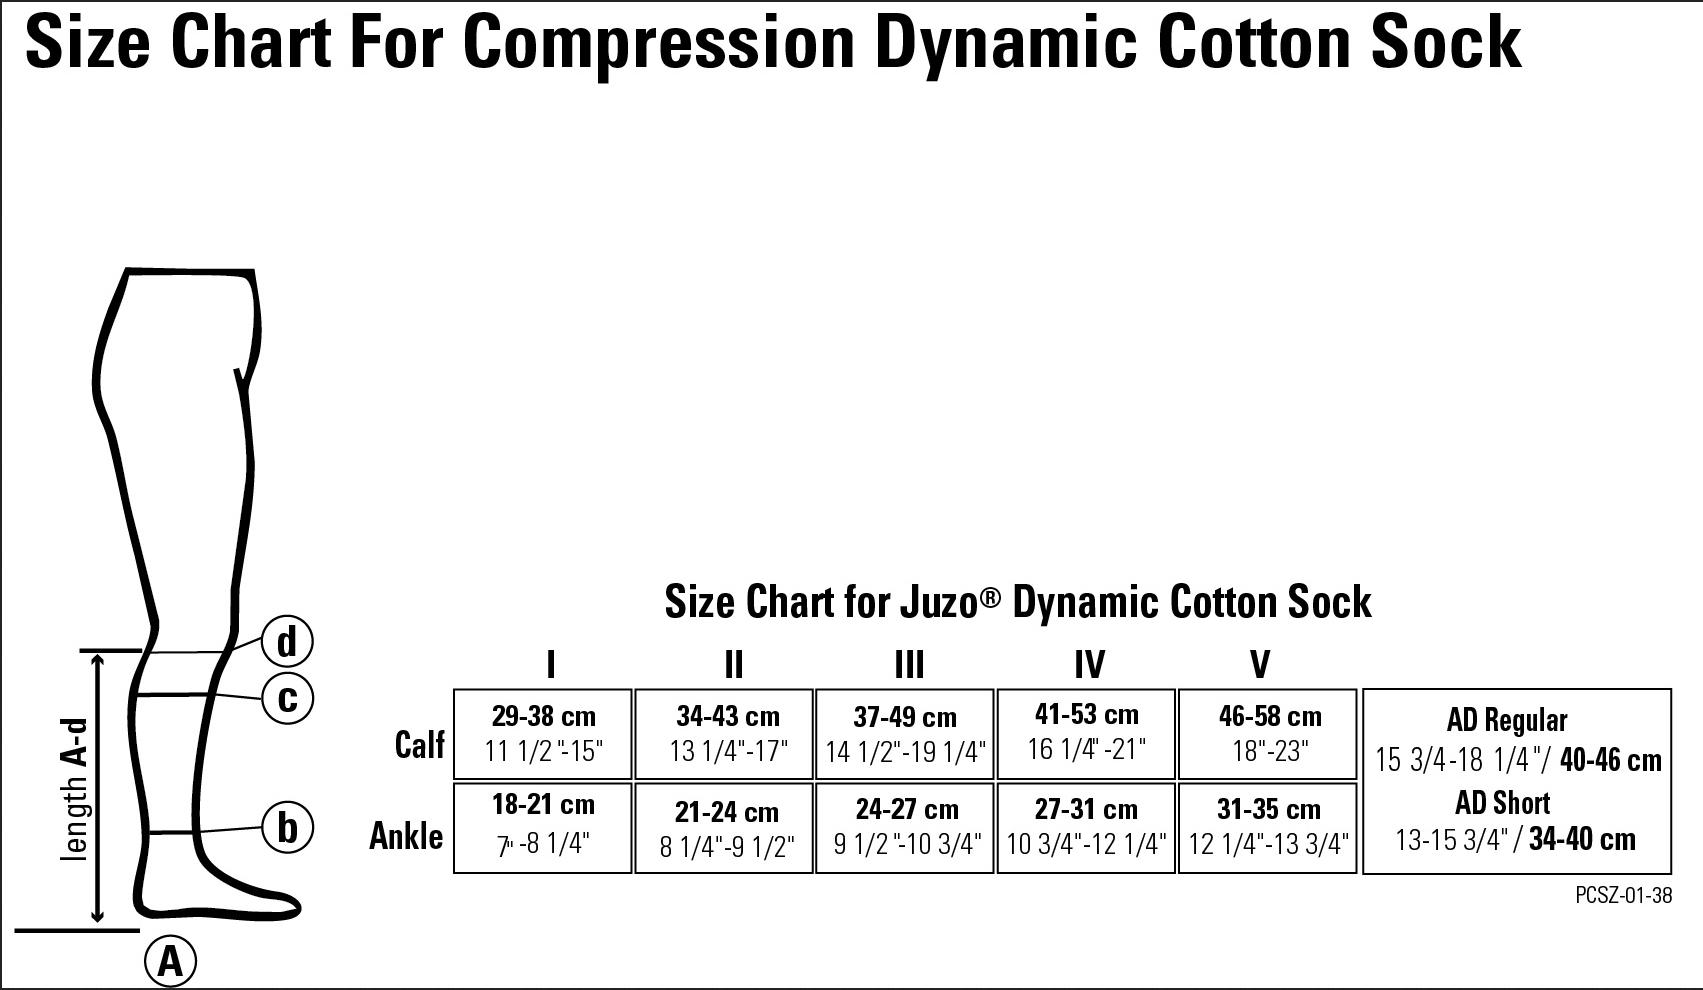 juzo dynamic cotton sock size chart